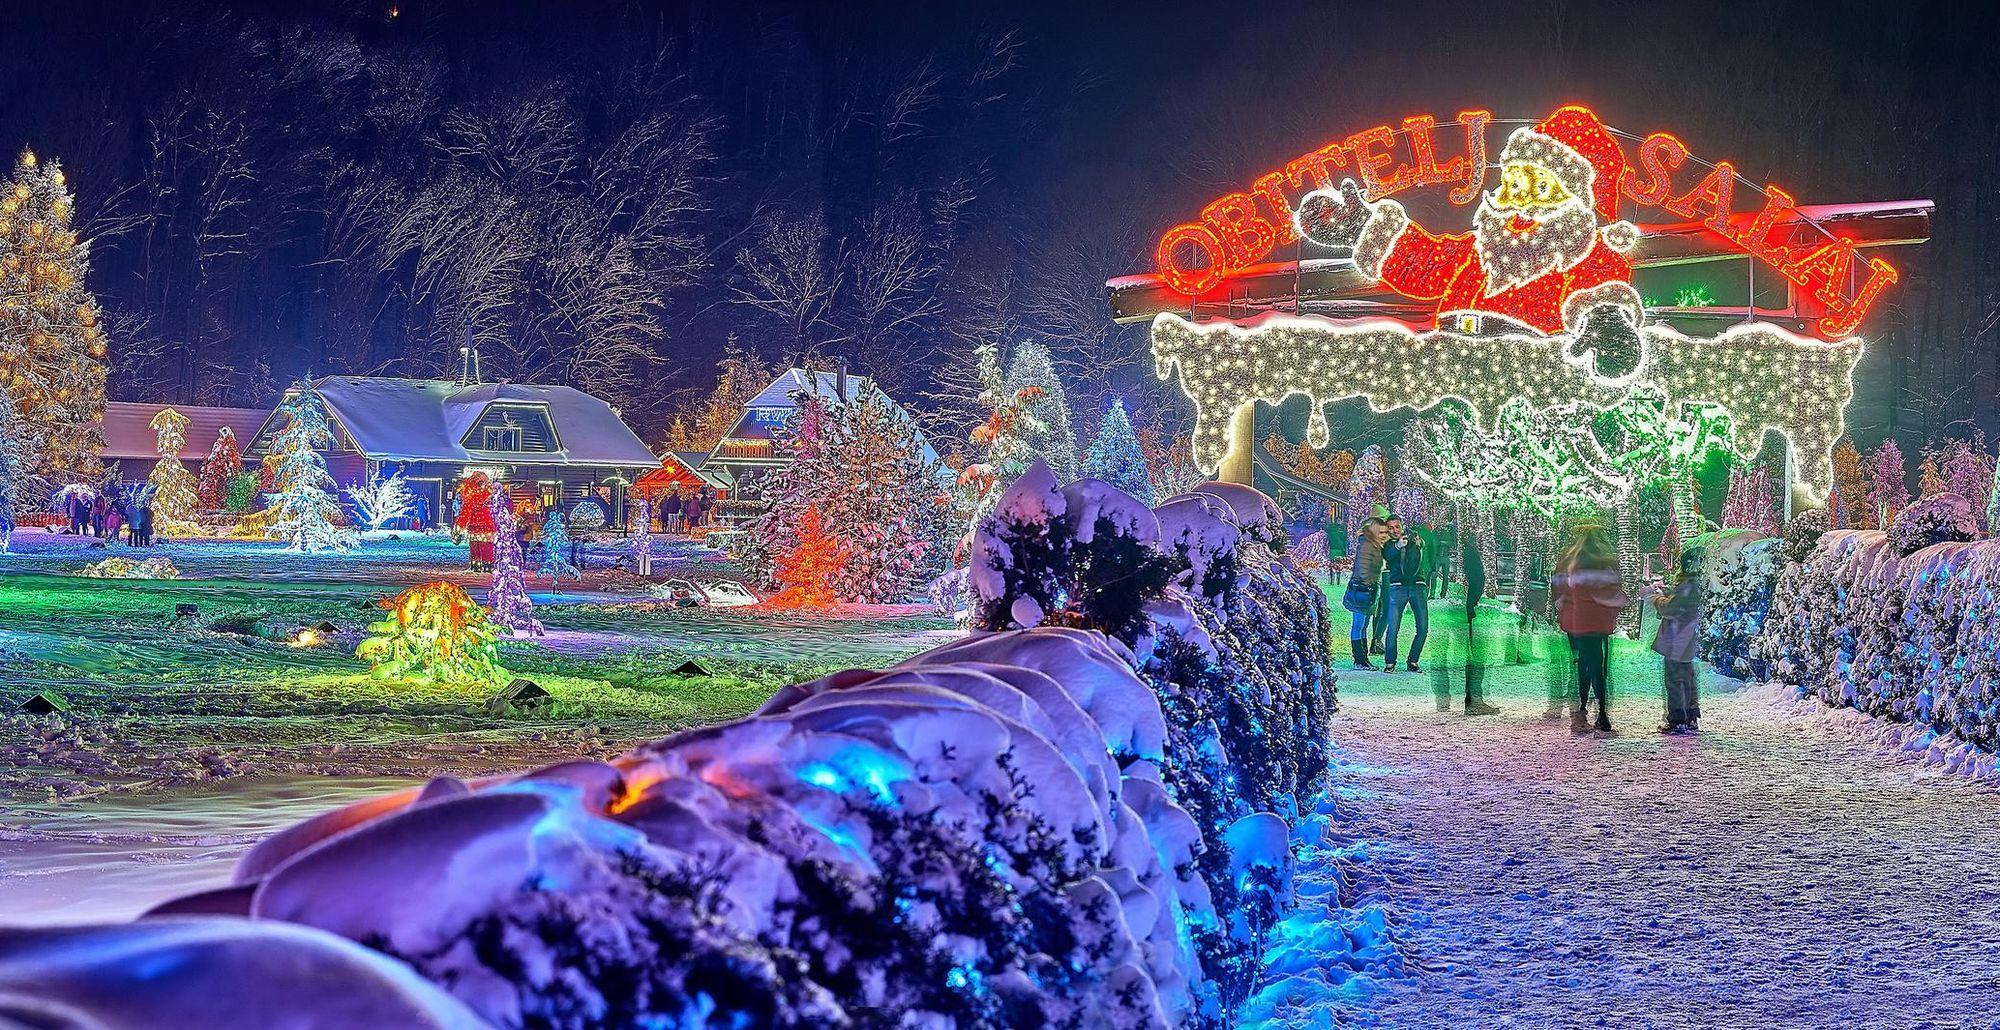 Salajland croatia Christmas